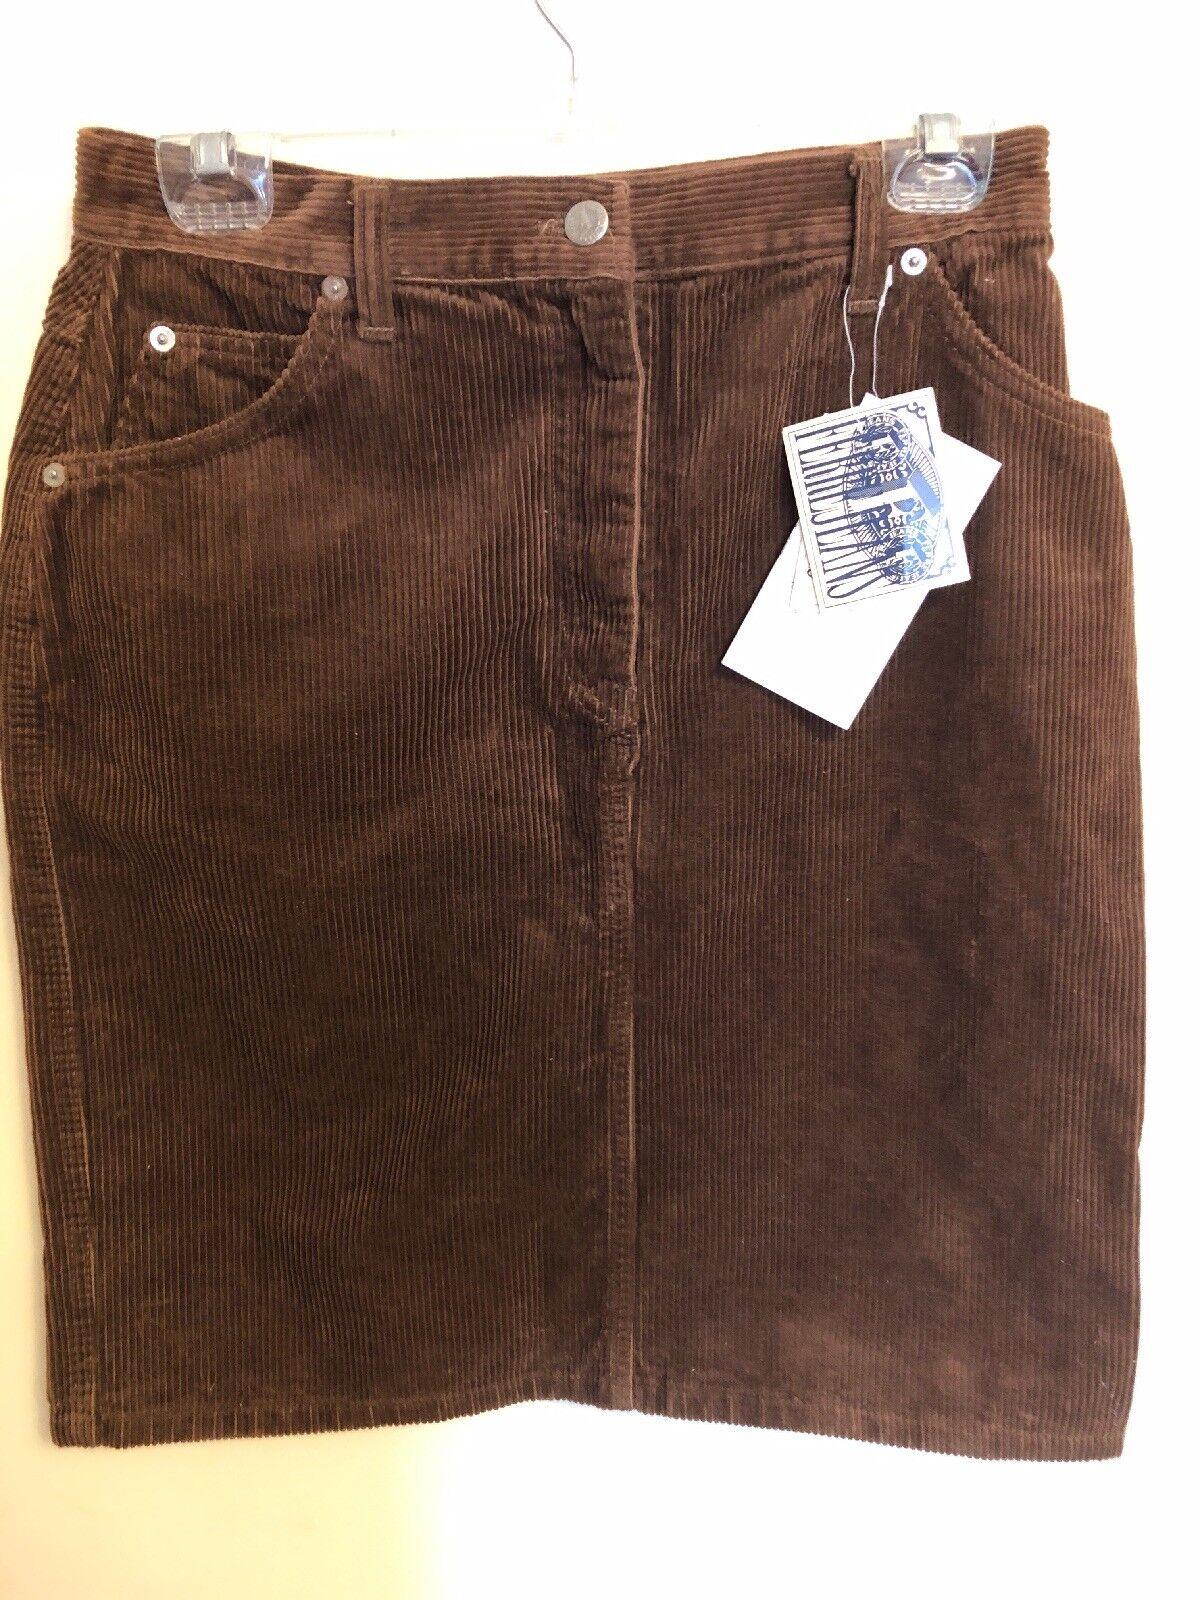 Ferre Jeans Made In  Corduroy braun Pencil Skirt 5-Pockets, Größe 31, New